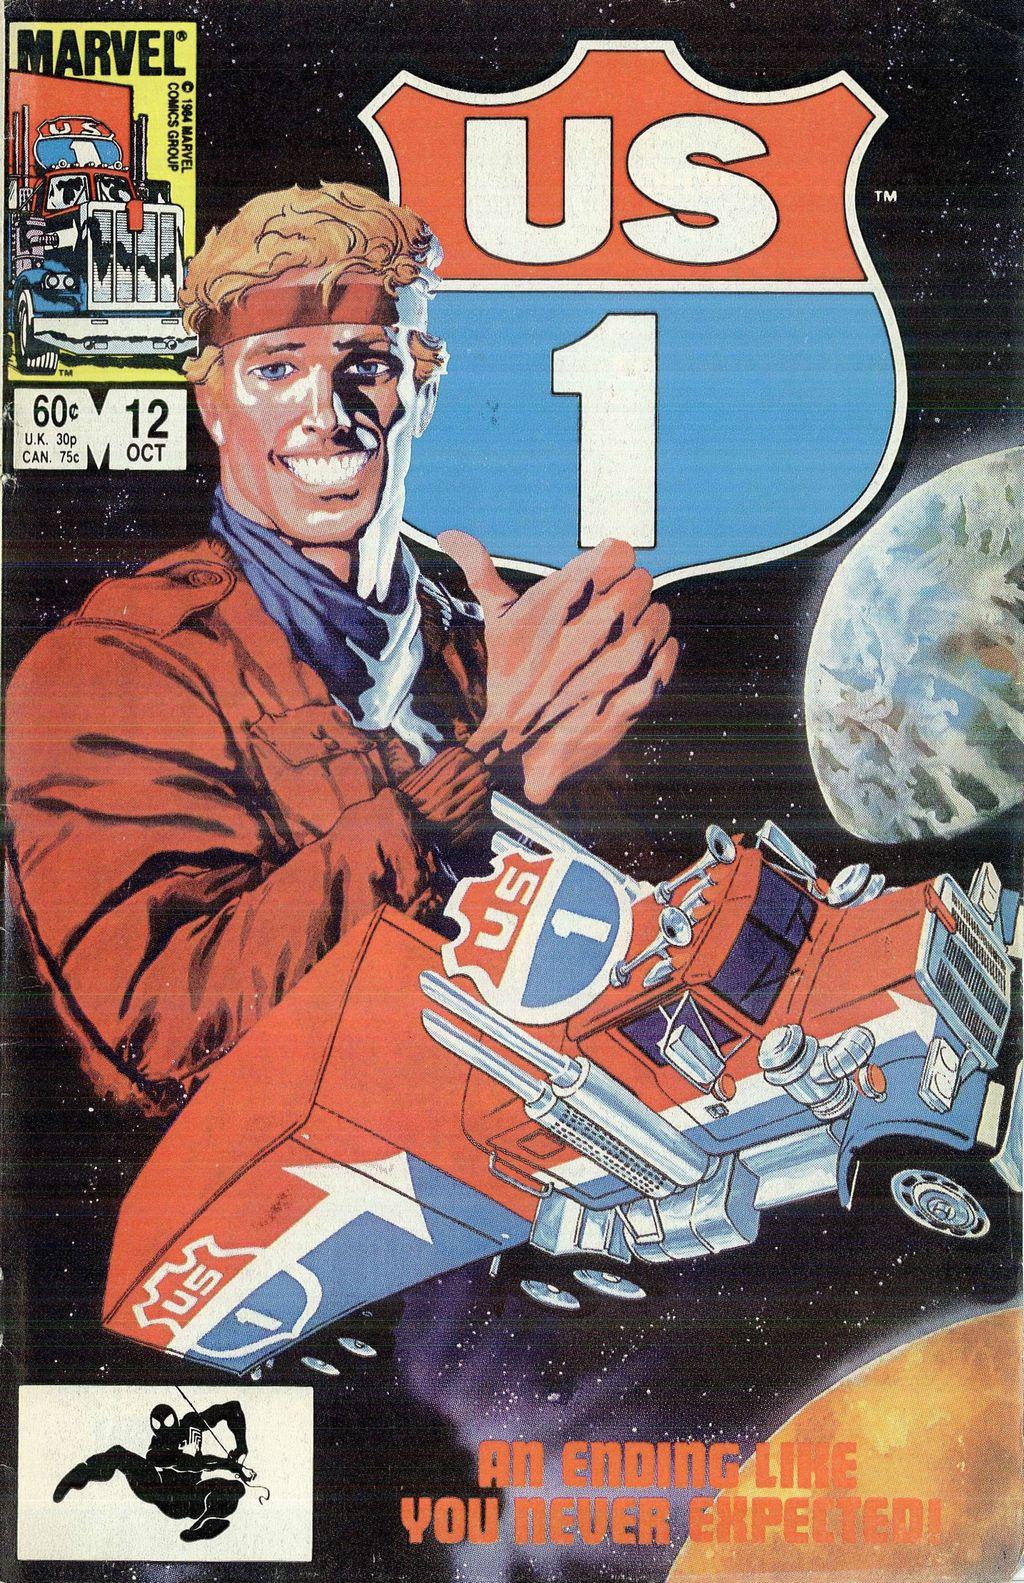 Read online U.S. 1 comic -  Issue #12 - 1